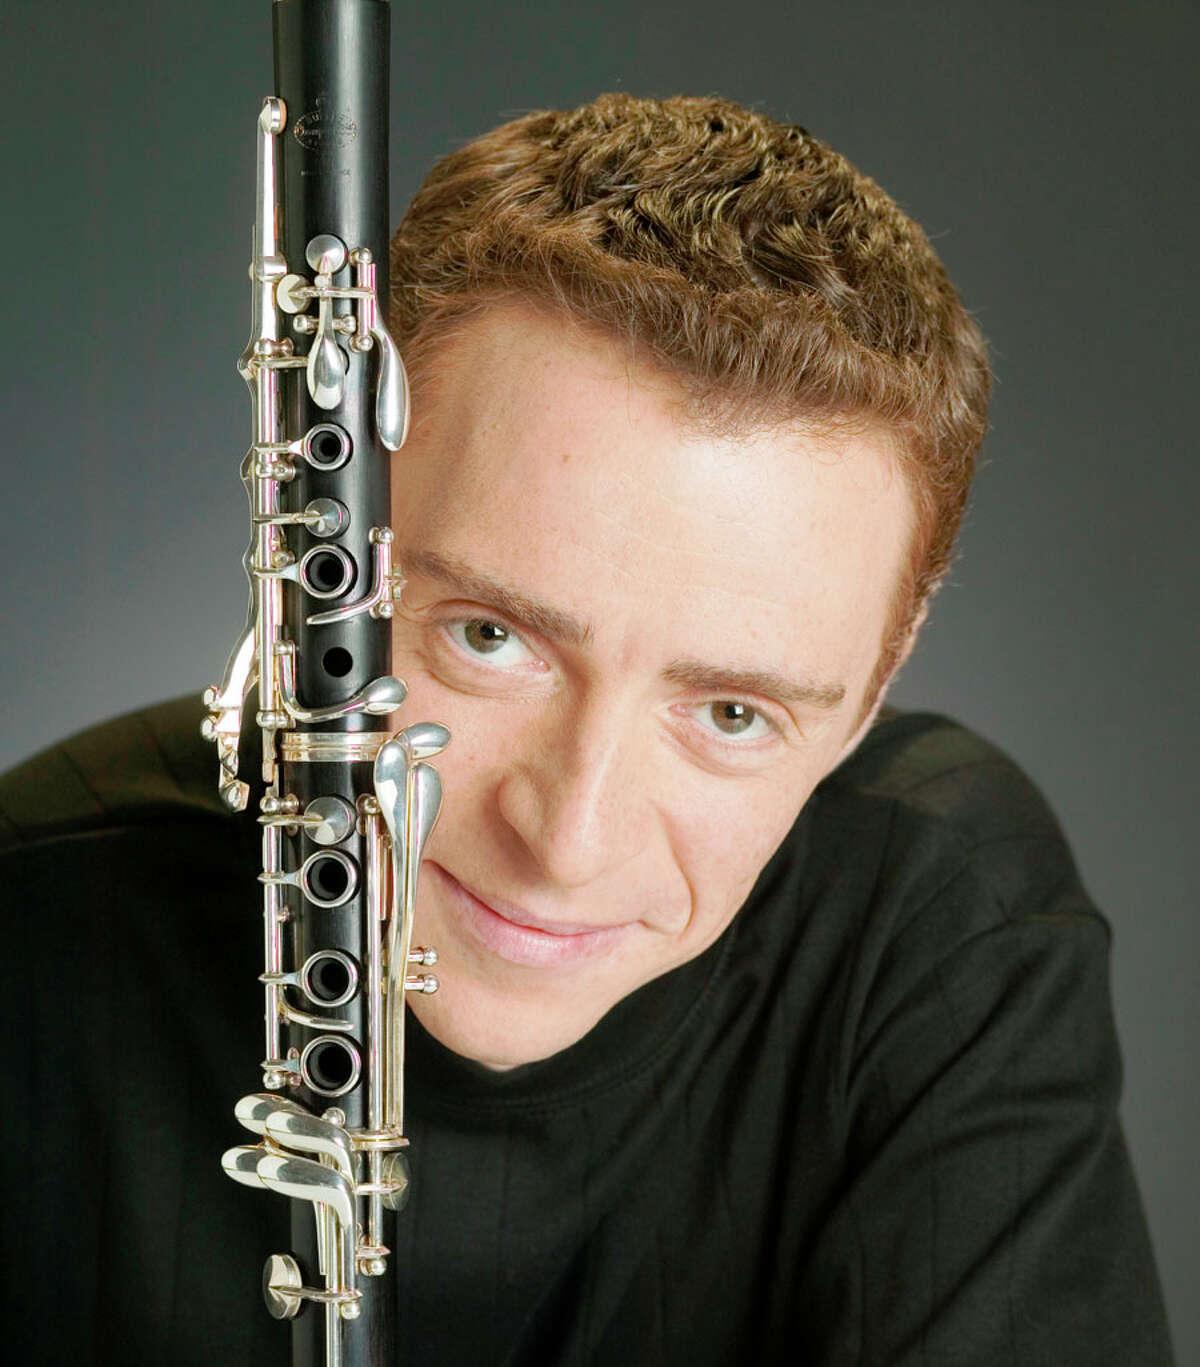 Clarinetist Ilya Shterenberg will be playing Mozart's Clarinet Concerto. COURTESY PHOTO